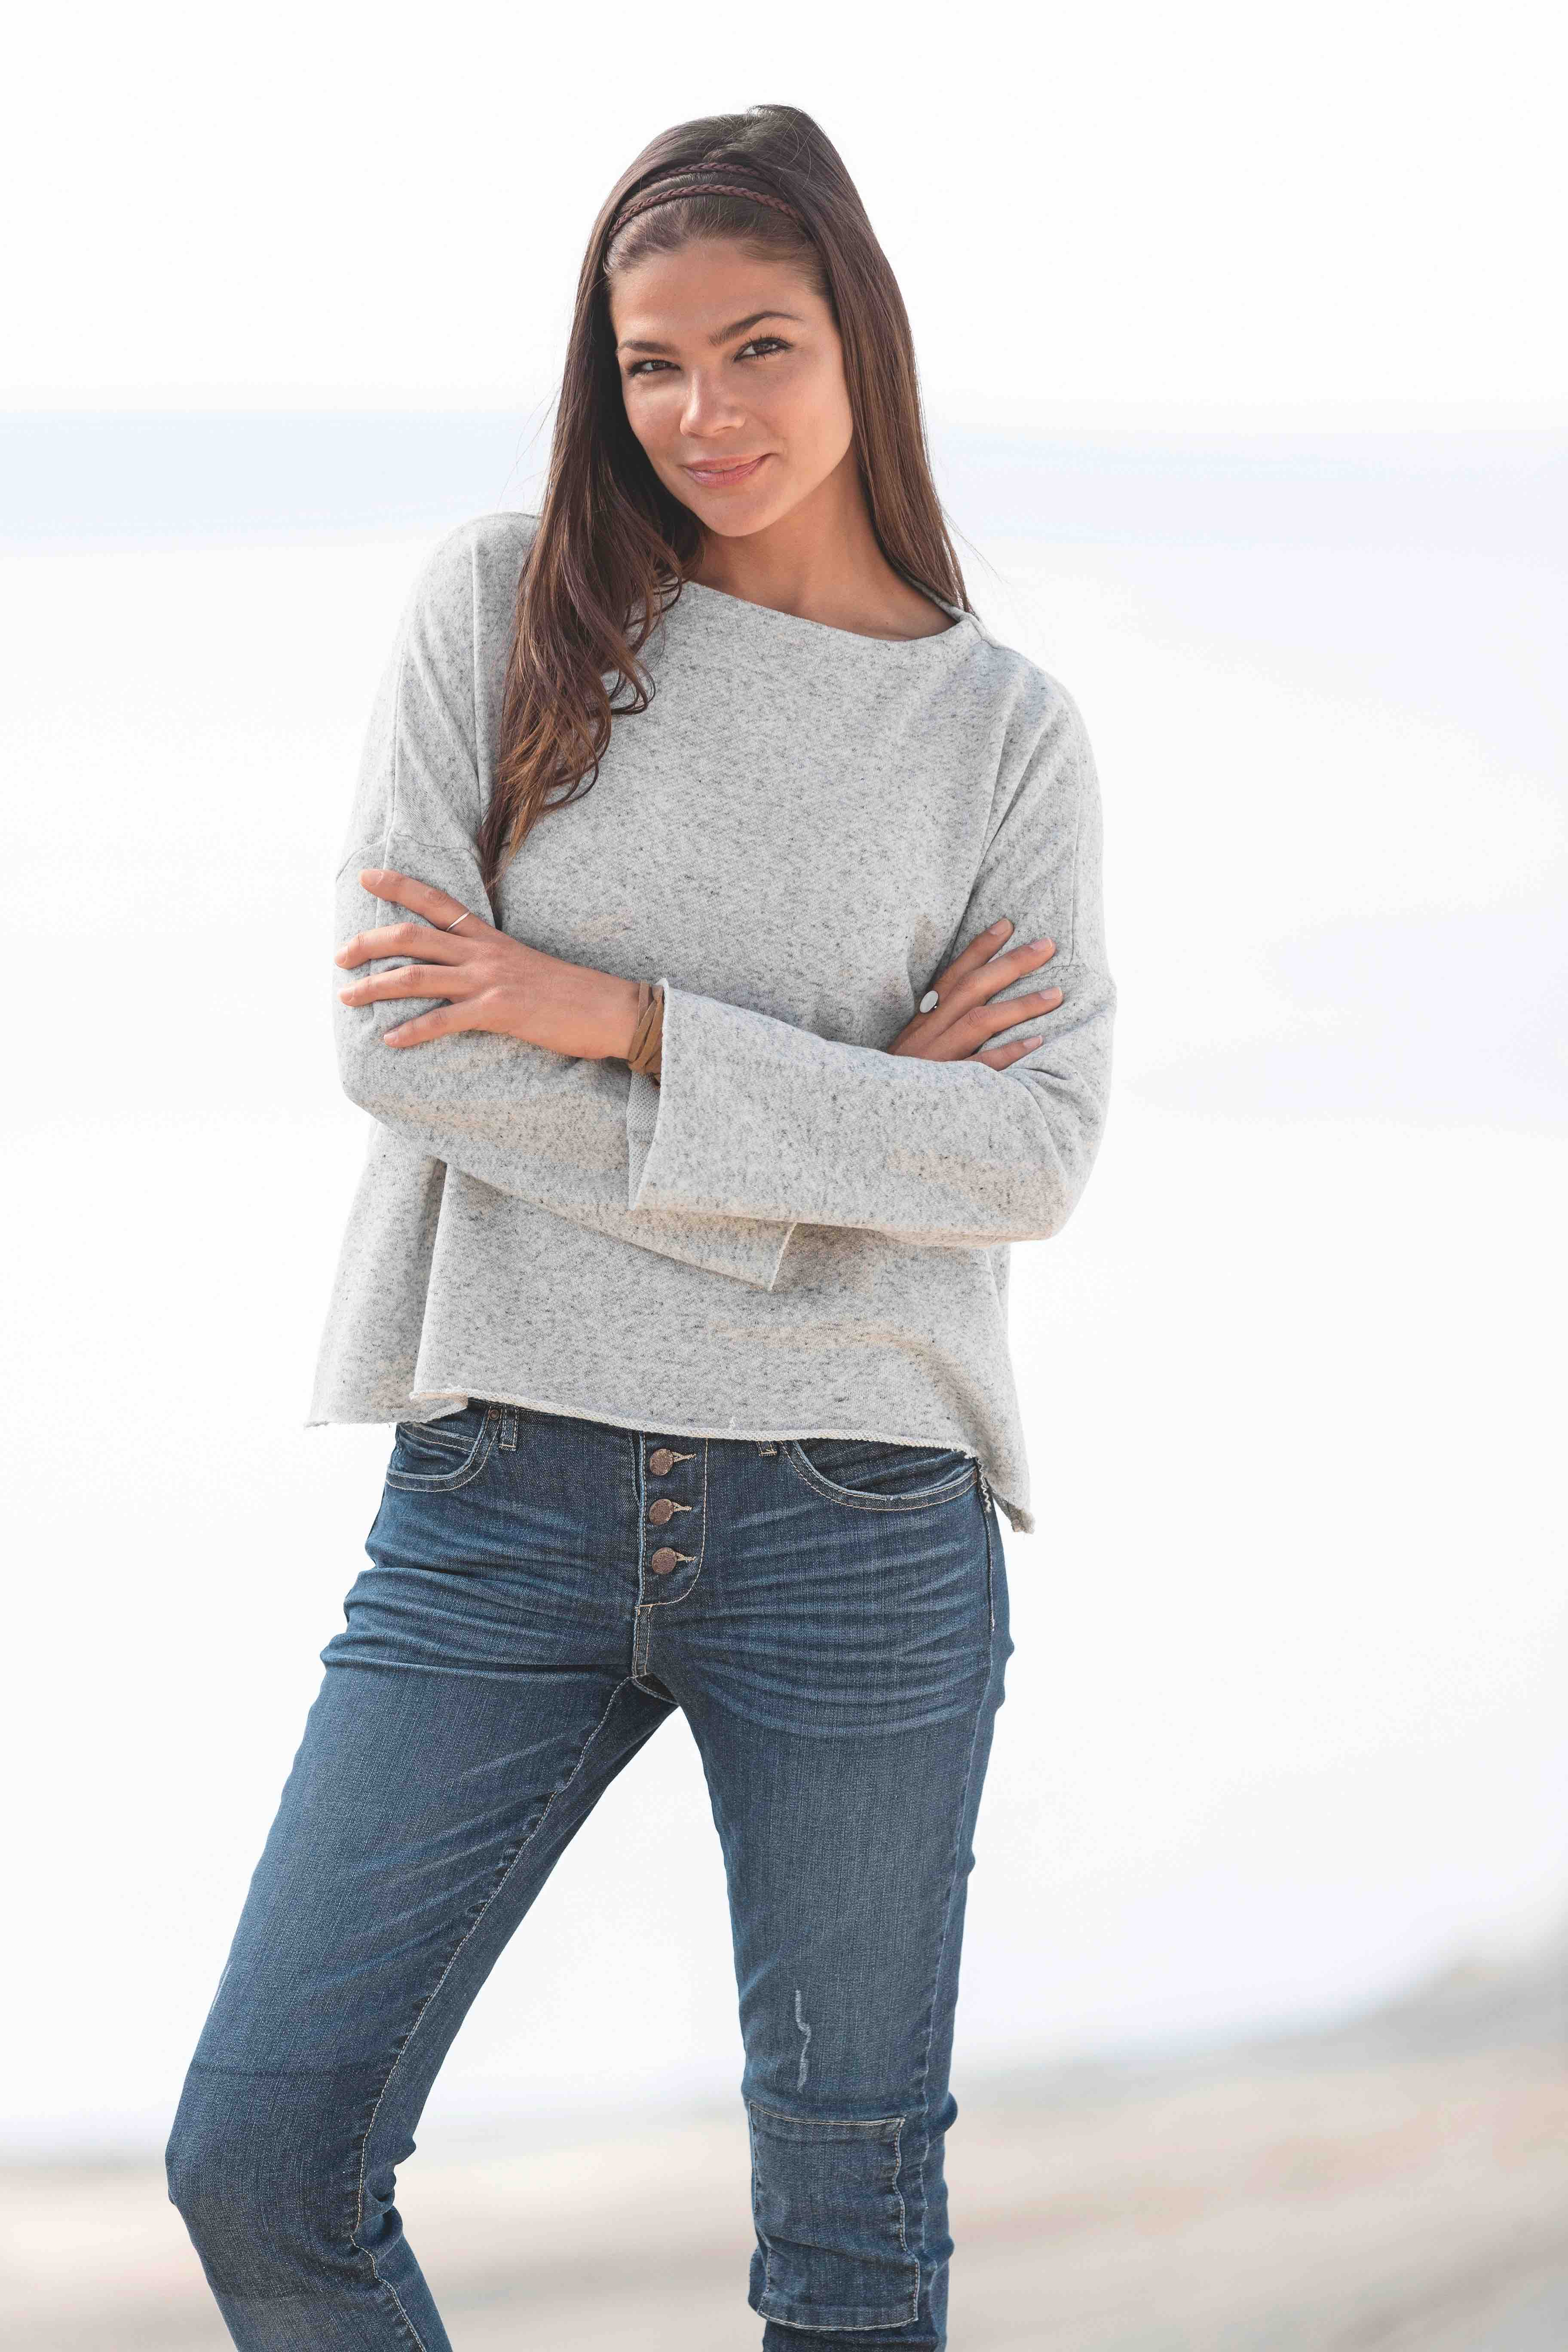 Web-Shine-Female-London-Model-Paula-High-Fashion-17.jpg#asset:51422